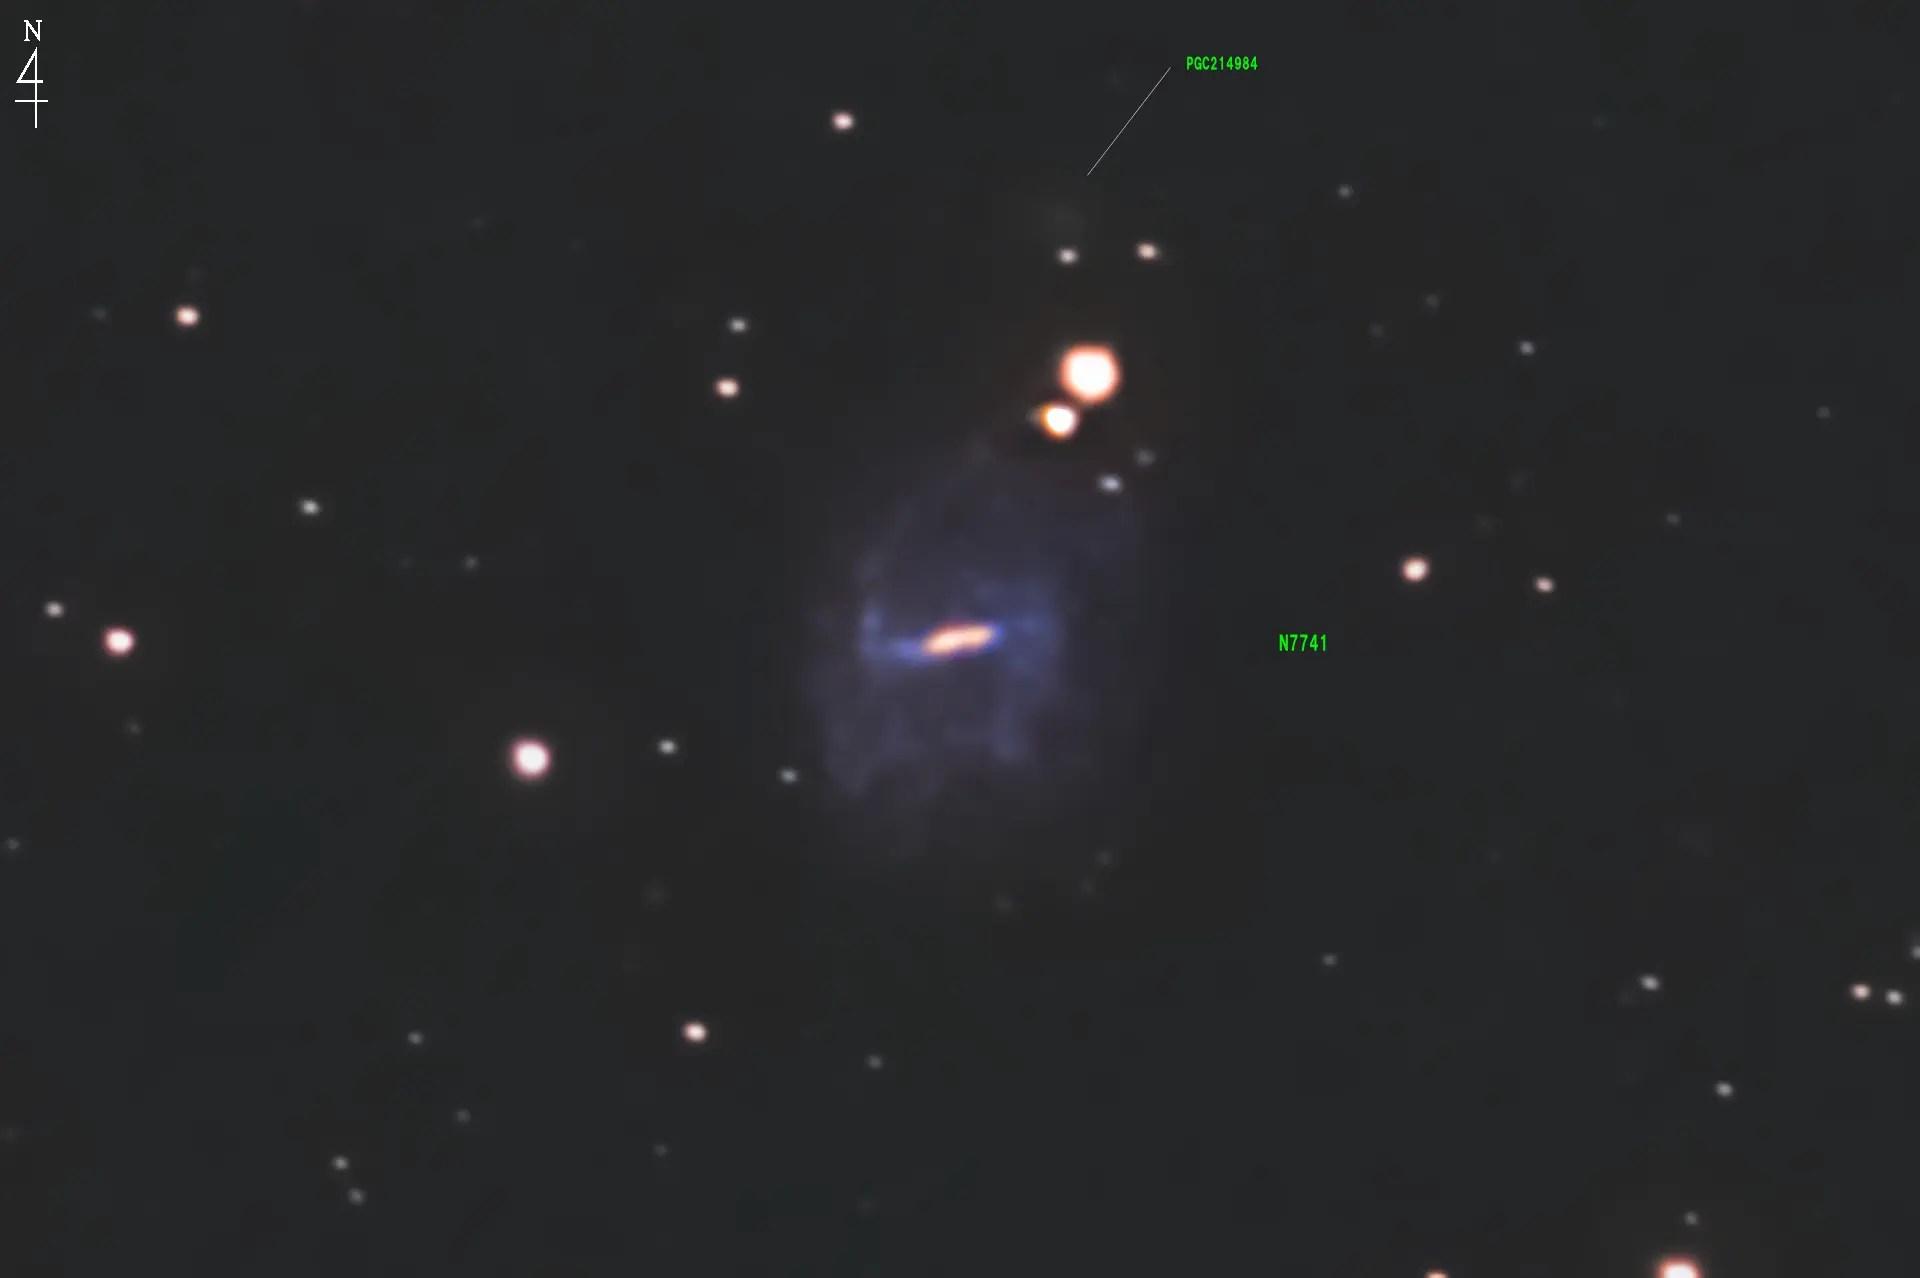 NGC7741【撮影済みNGC天體の寫真一覧とデータや星図】